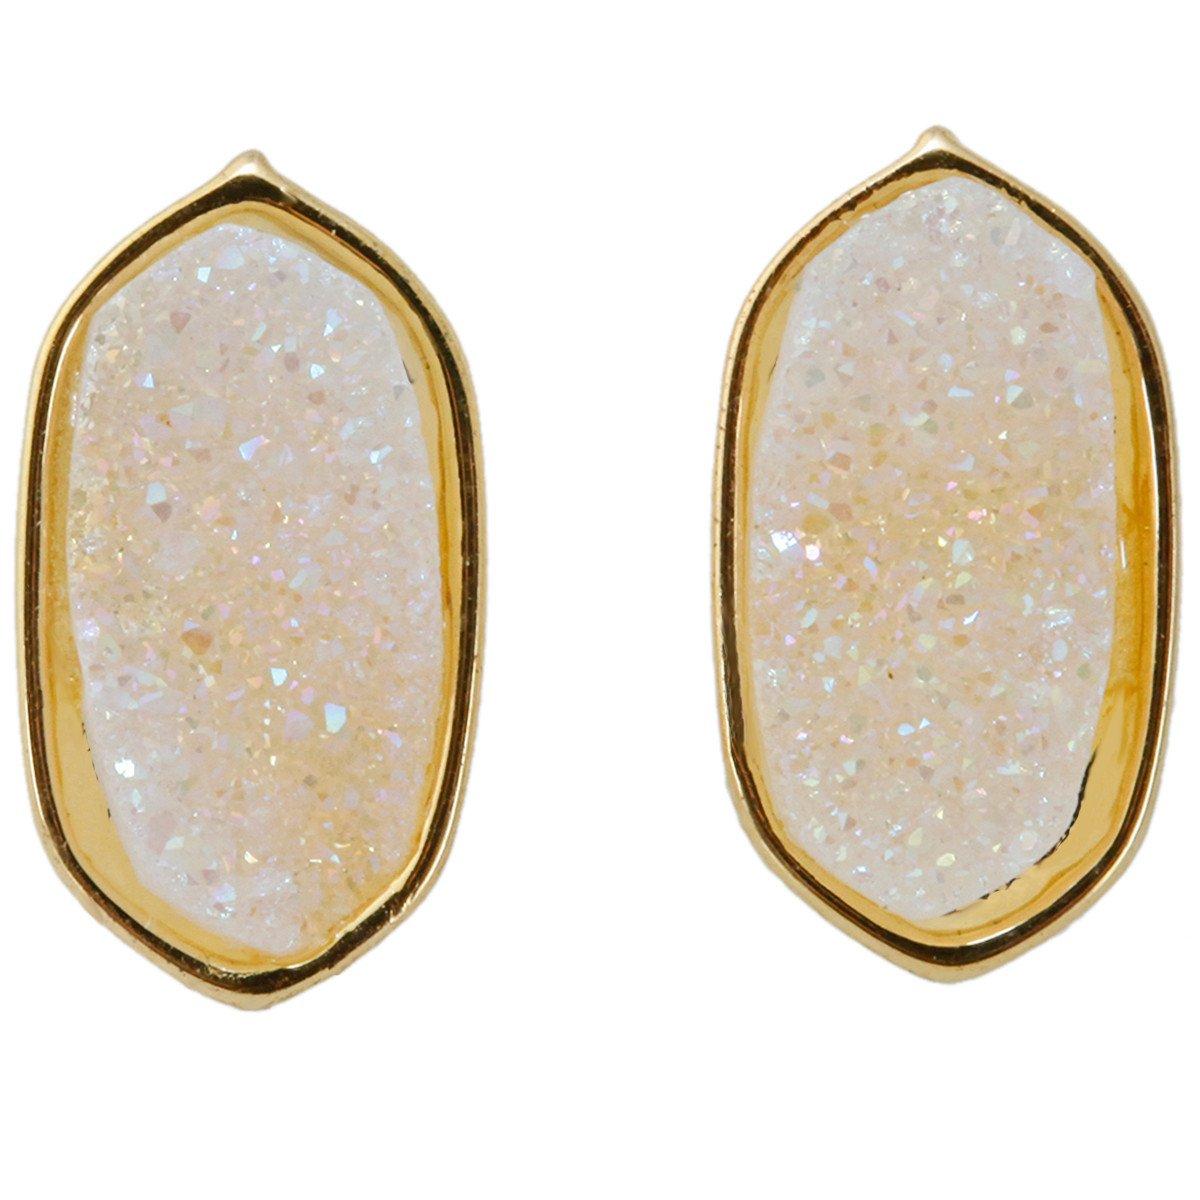 SUNYIK White AB Crystal Titanium Quartz Geode Druzy Oval Stud Earrings